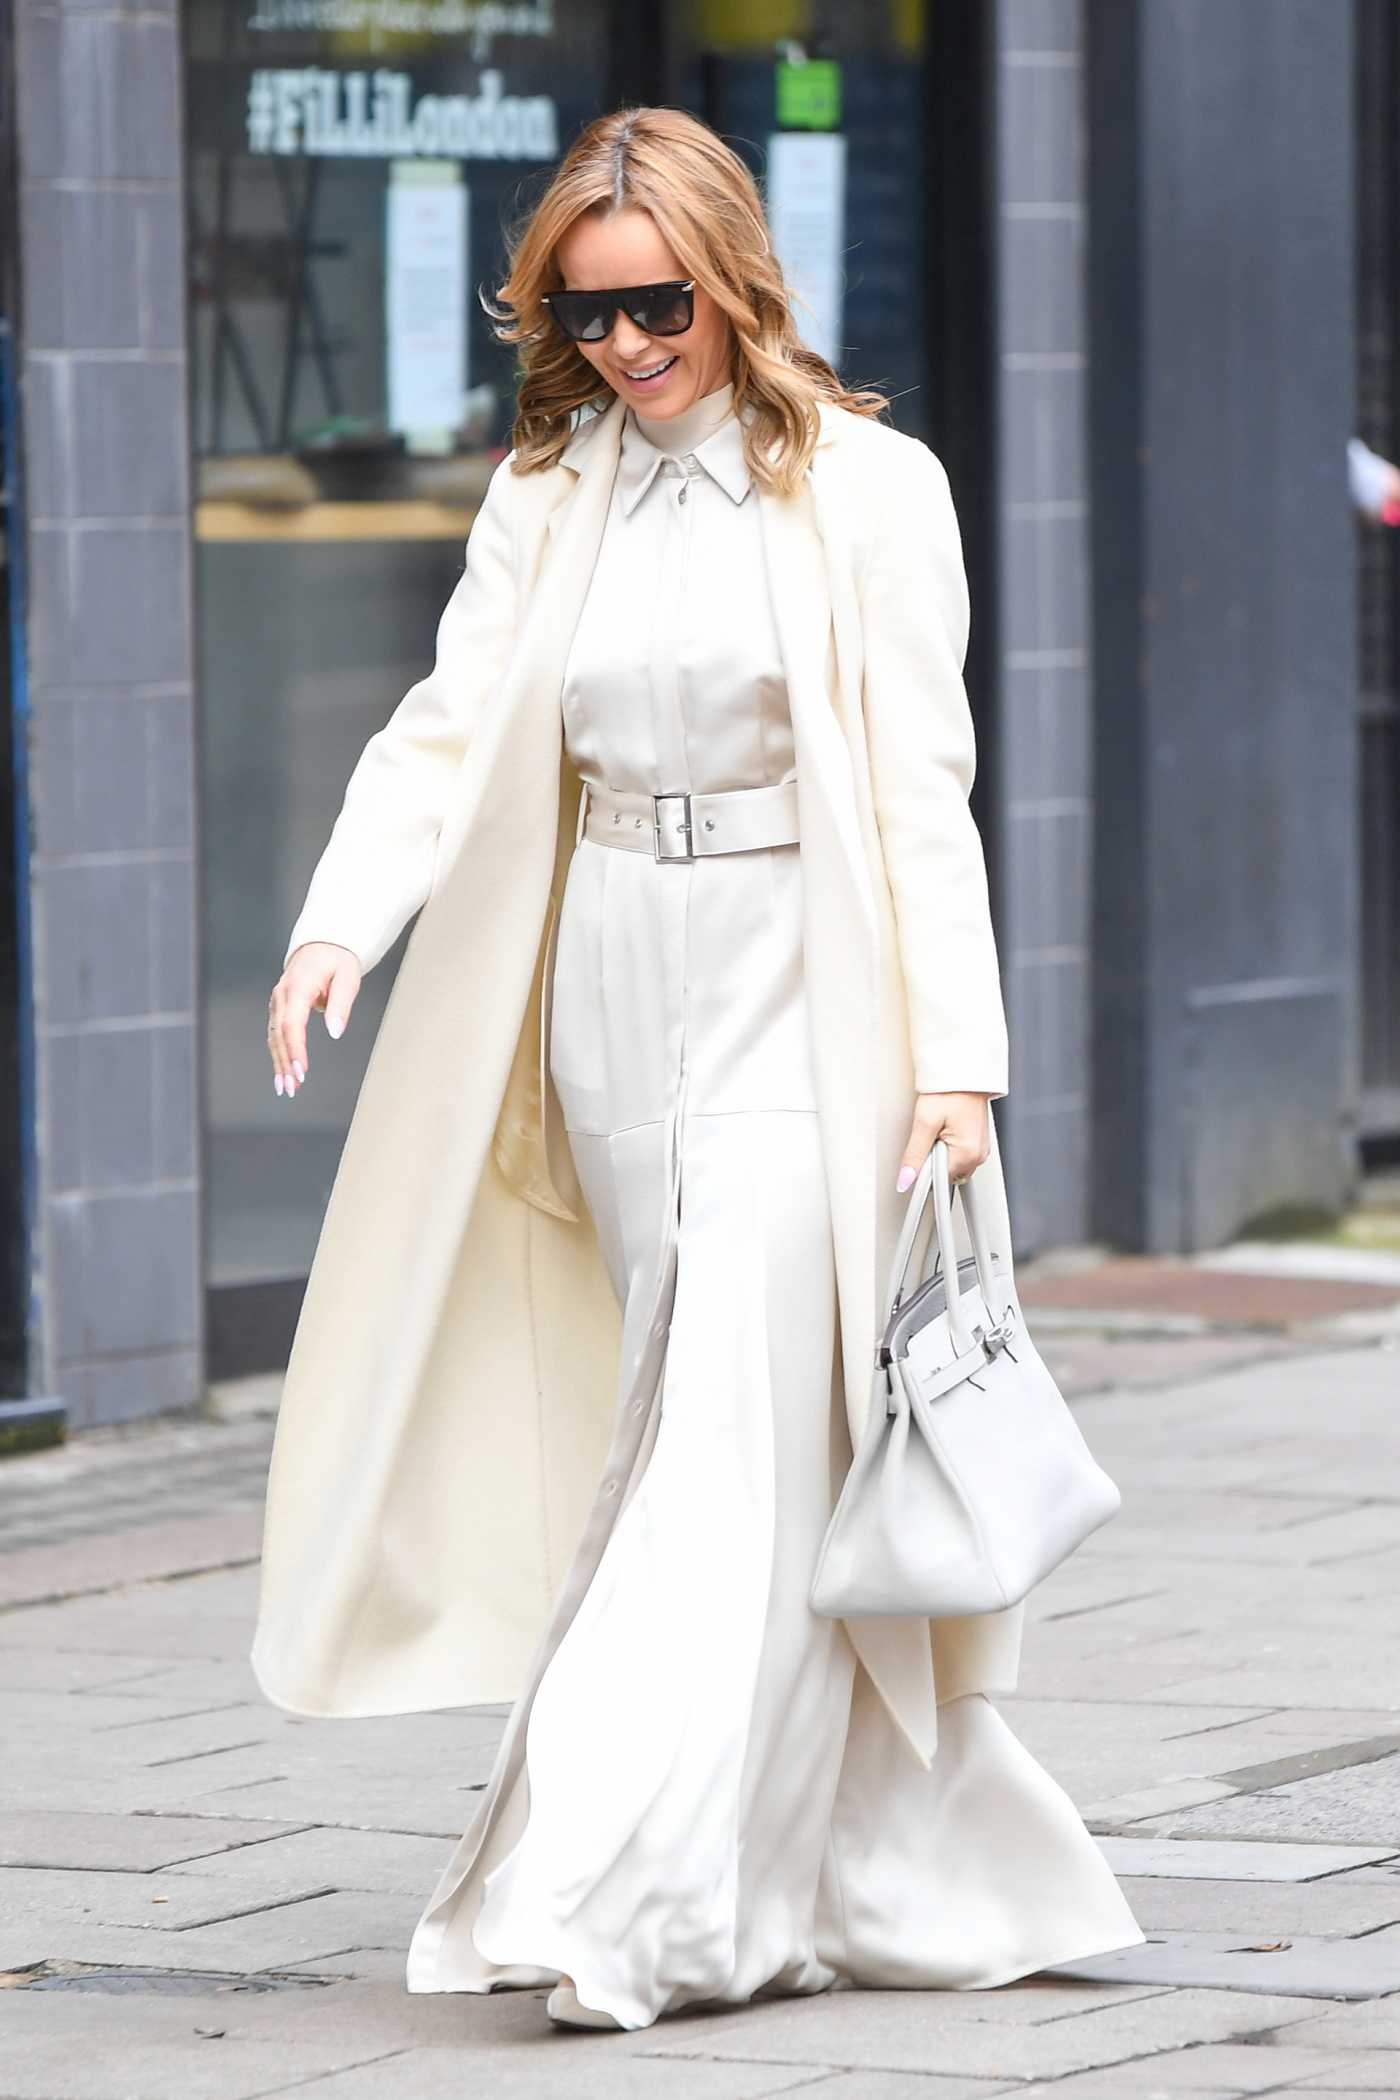 Amanda Holden in a White Coat Leaves the Global Studios in London 01/15/2021